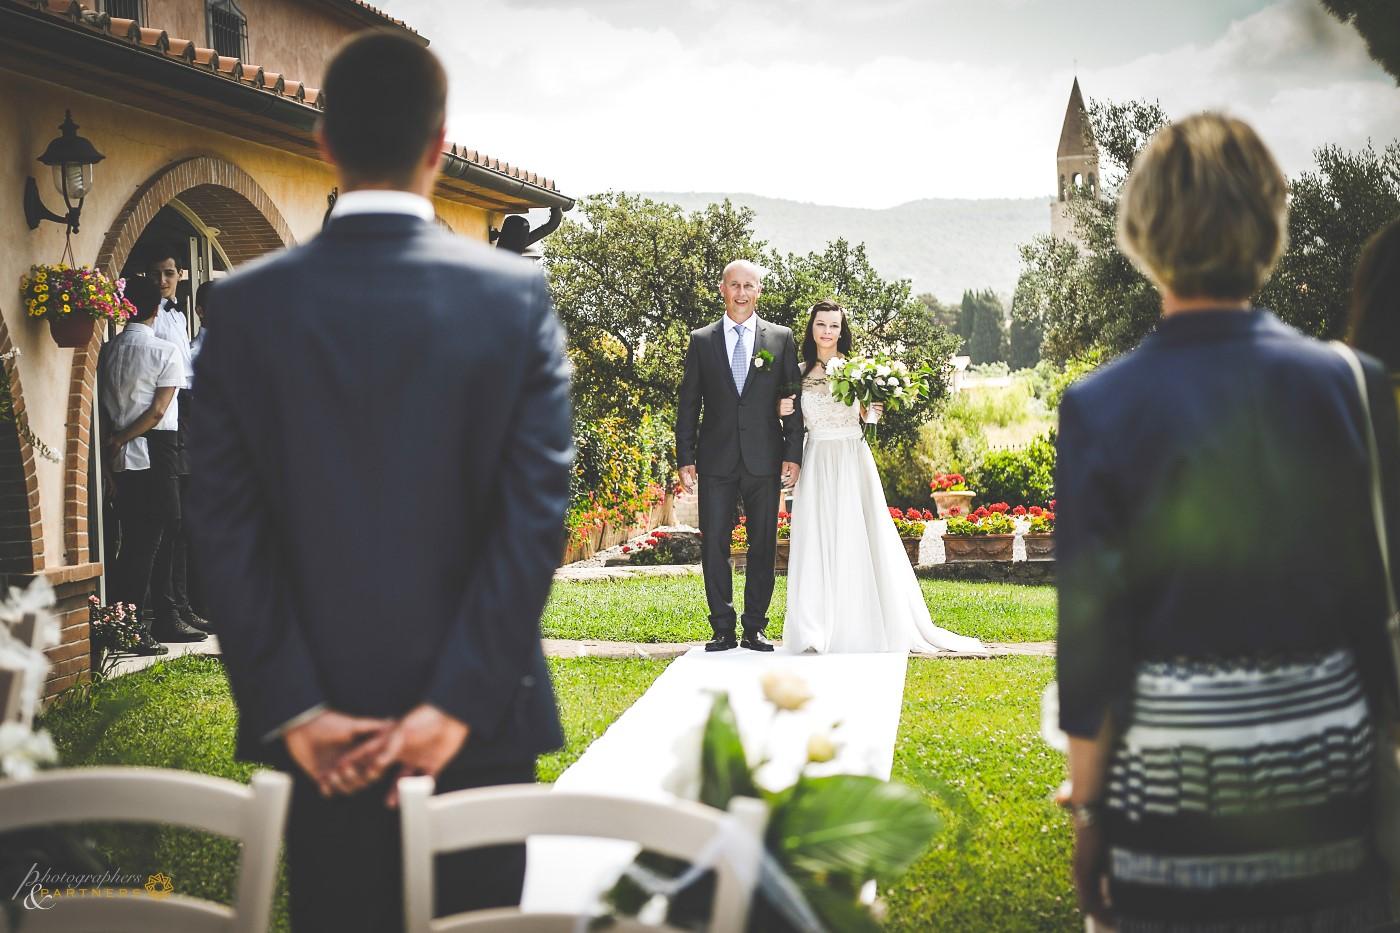 photographer_weddings_grosseto_03.jpg